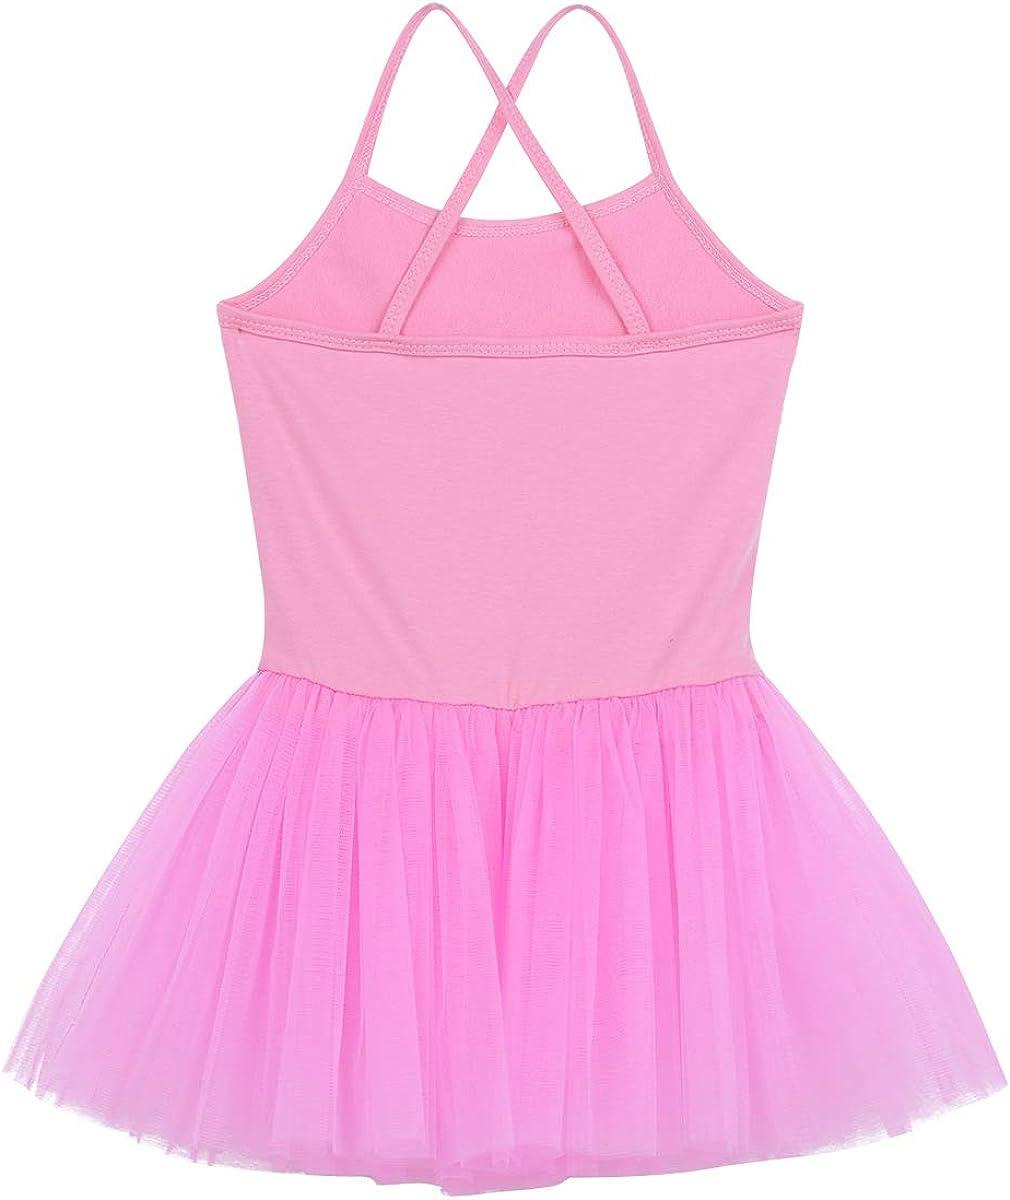 Alvivi Kids Girls Shiny Sequins Camisole Leotard Ballet Tutu Dress Gymnastic Workout Activewear